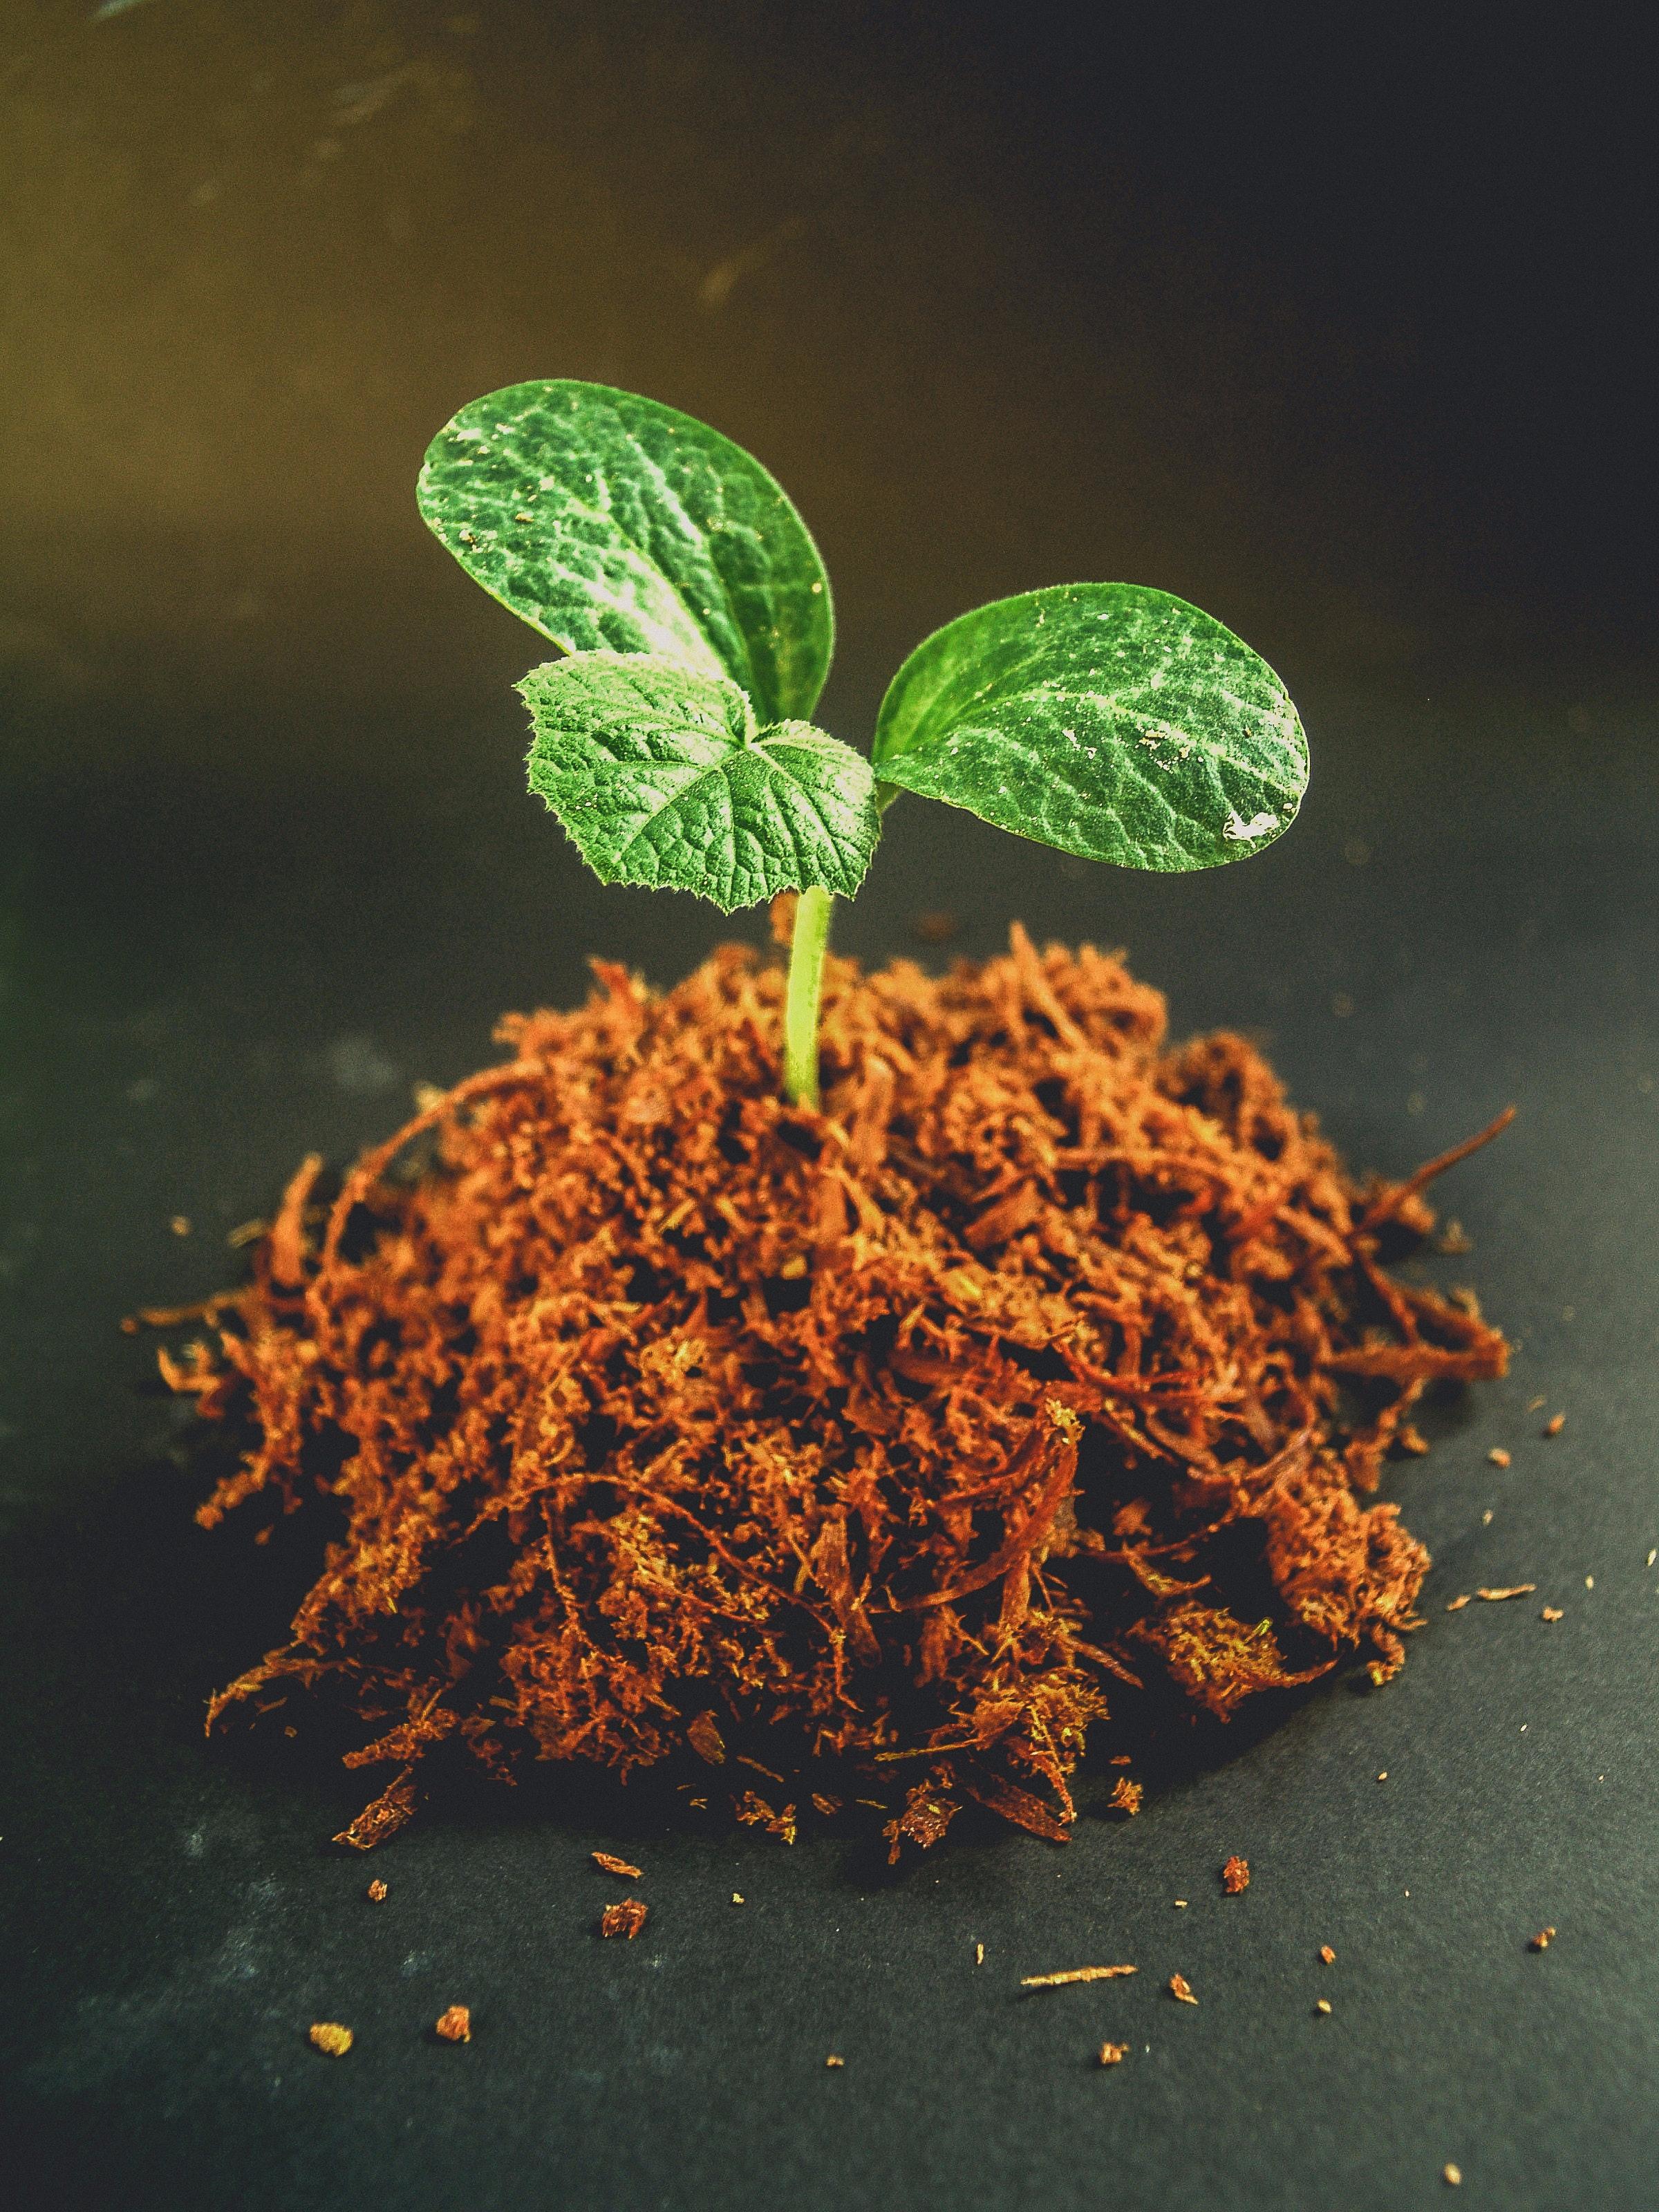 dirt-gardening-green-1214394.jpg